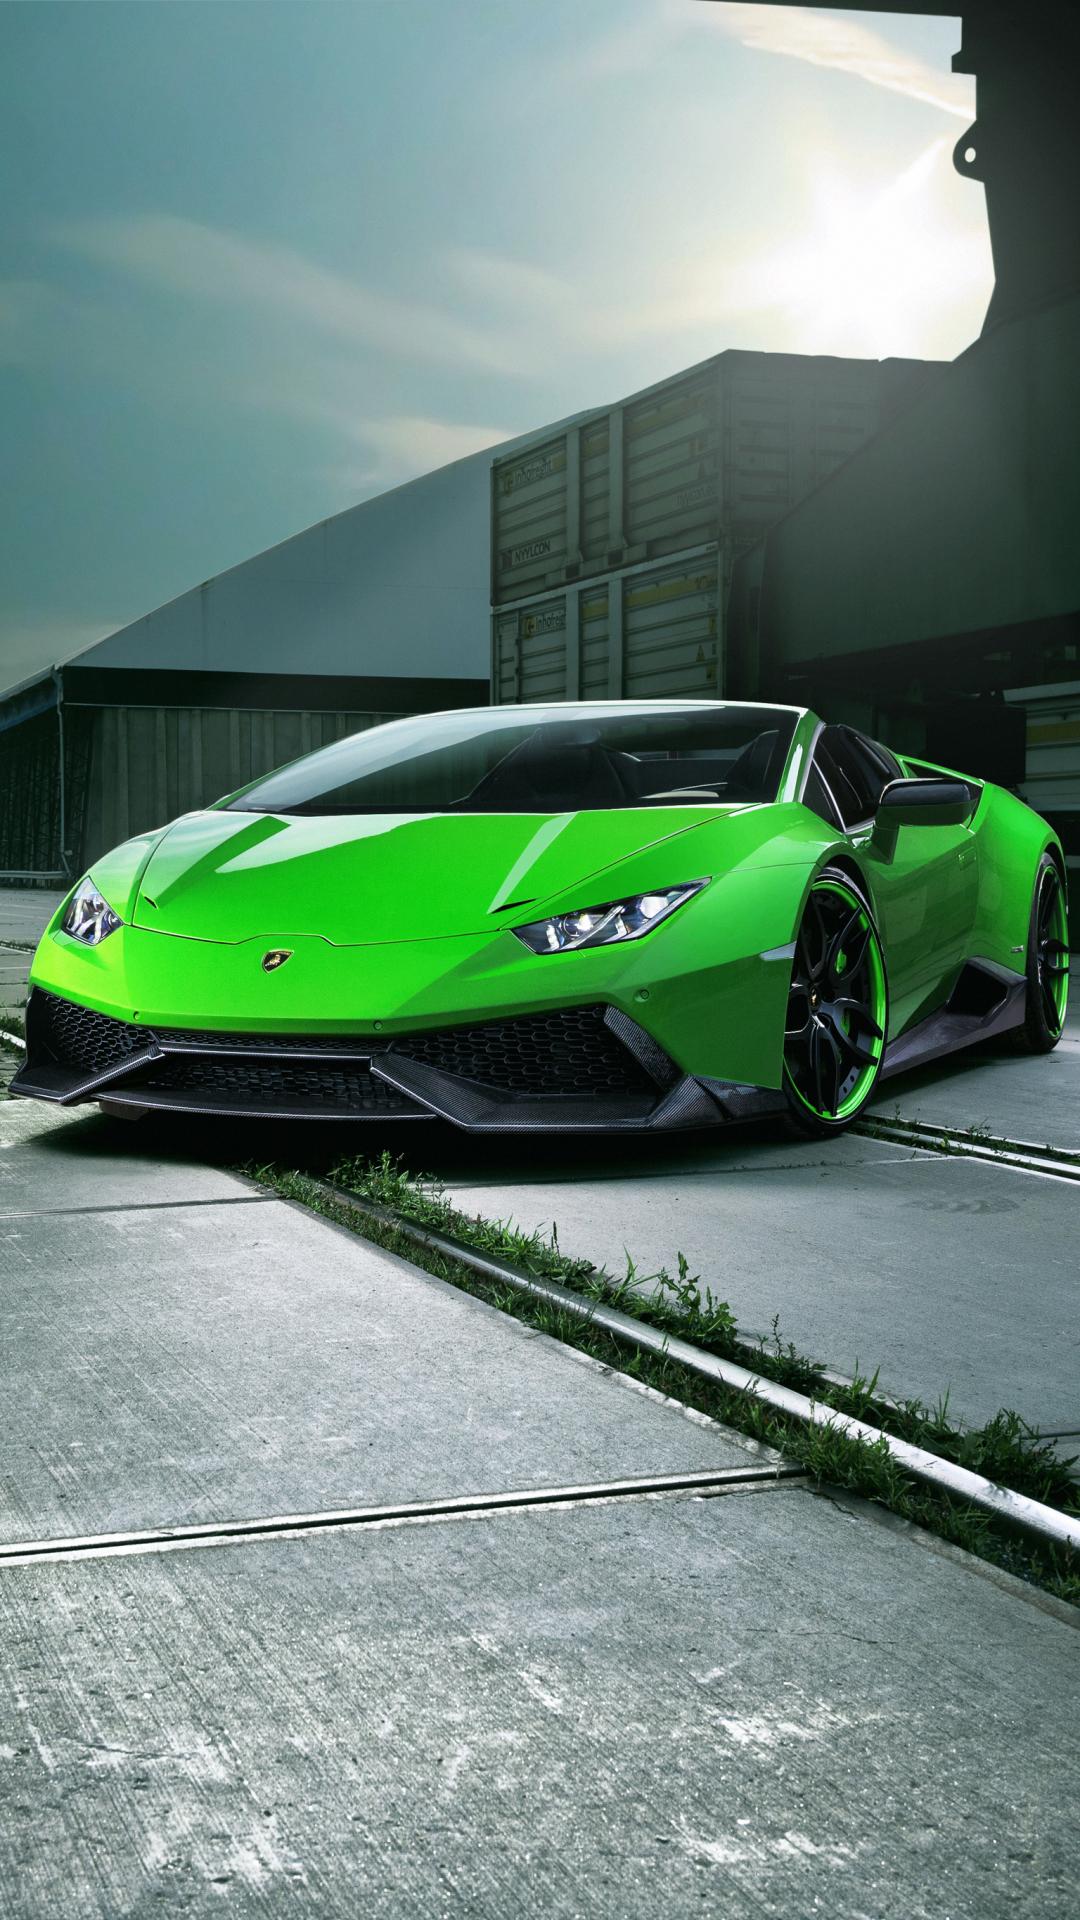 Iphone 7 Plus Vehicles Lamborghini Huracan Wallpaper